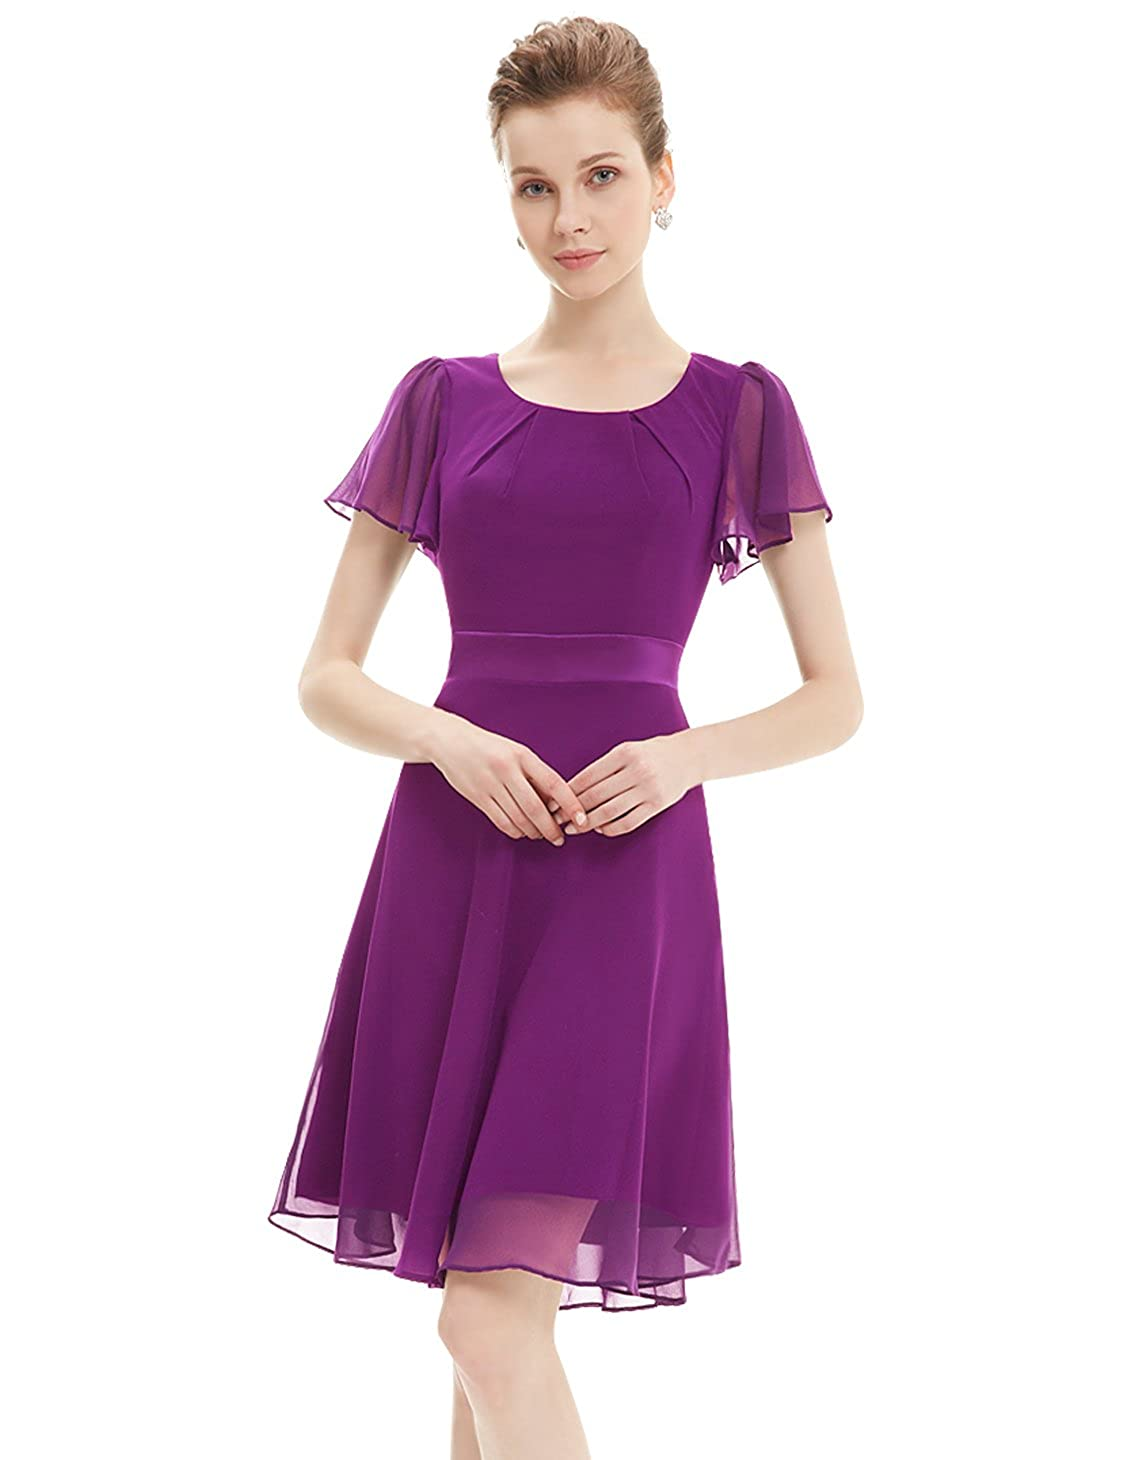 3896775e7e0 Ever-Pretty Womens Short Sleeve Casual Chiffon Bridesmaids Dress 14 US Dark  Purple at Amazon Women s Clothing store